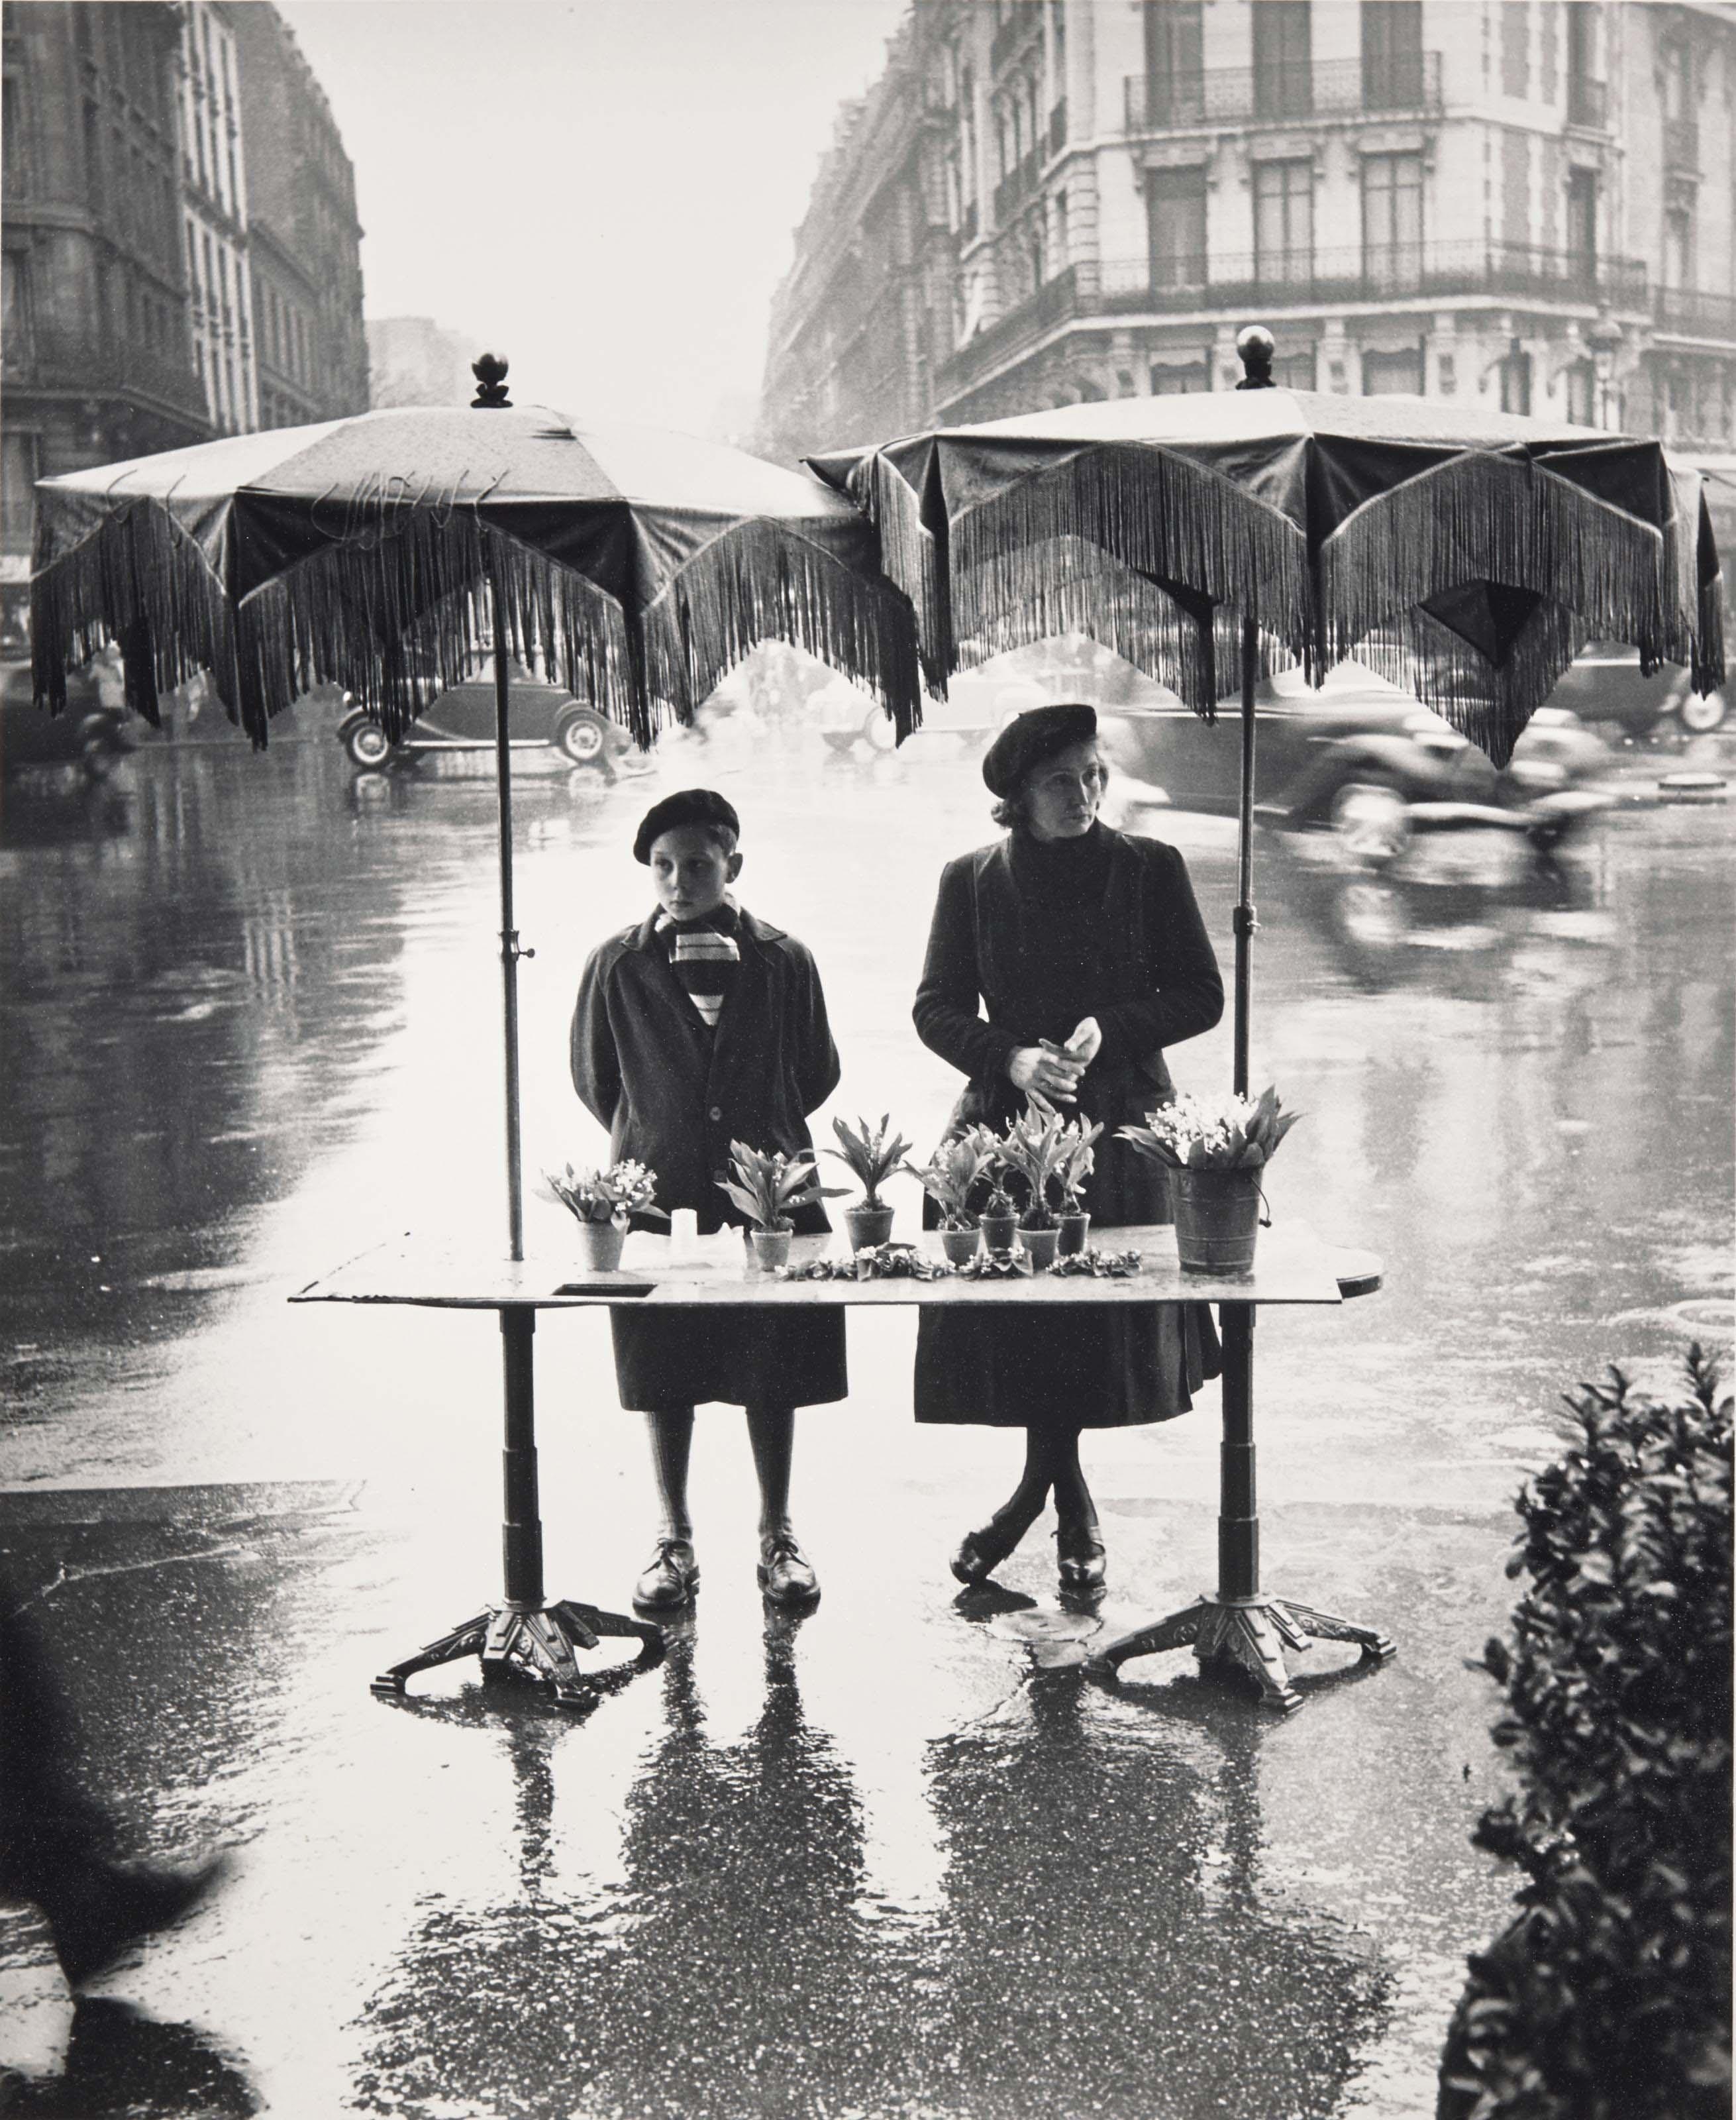 1er mai, place Victor-Basch, Paris, 1950